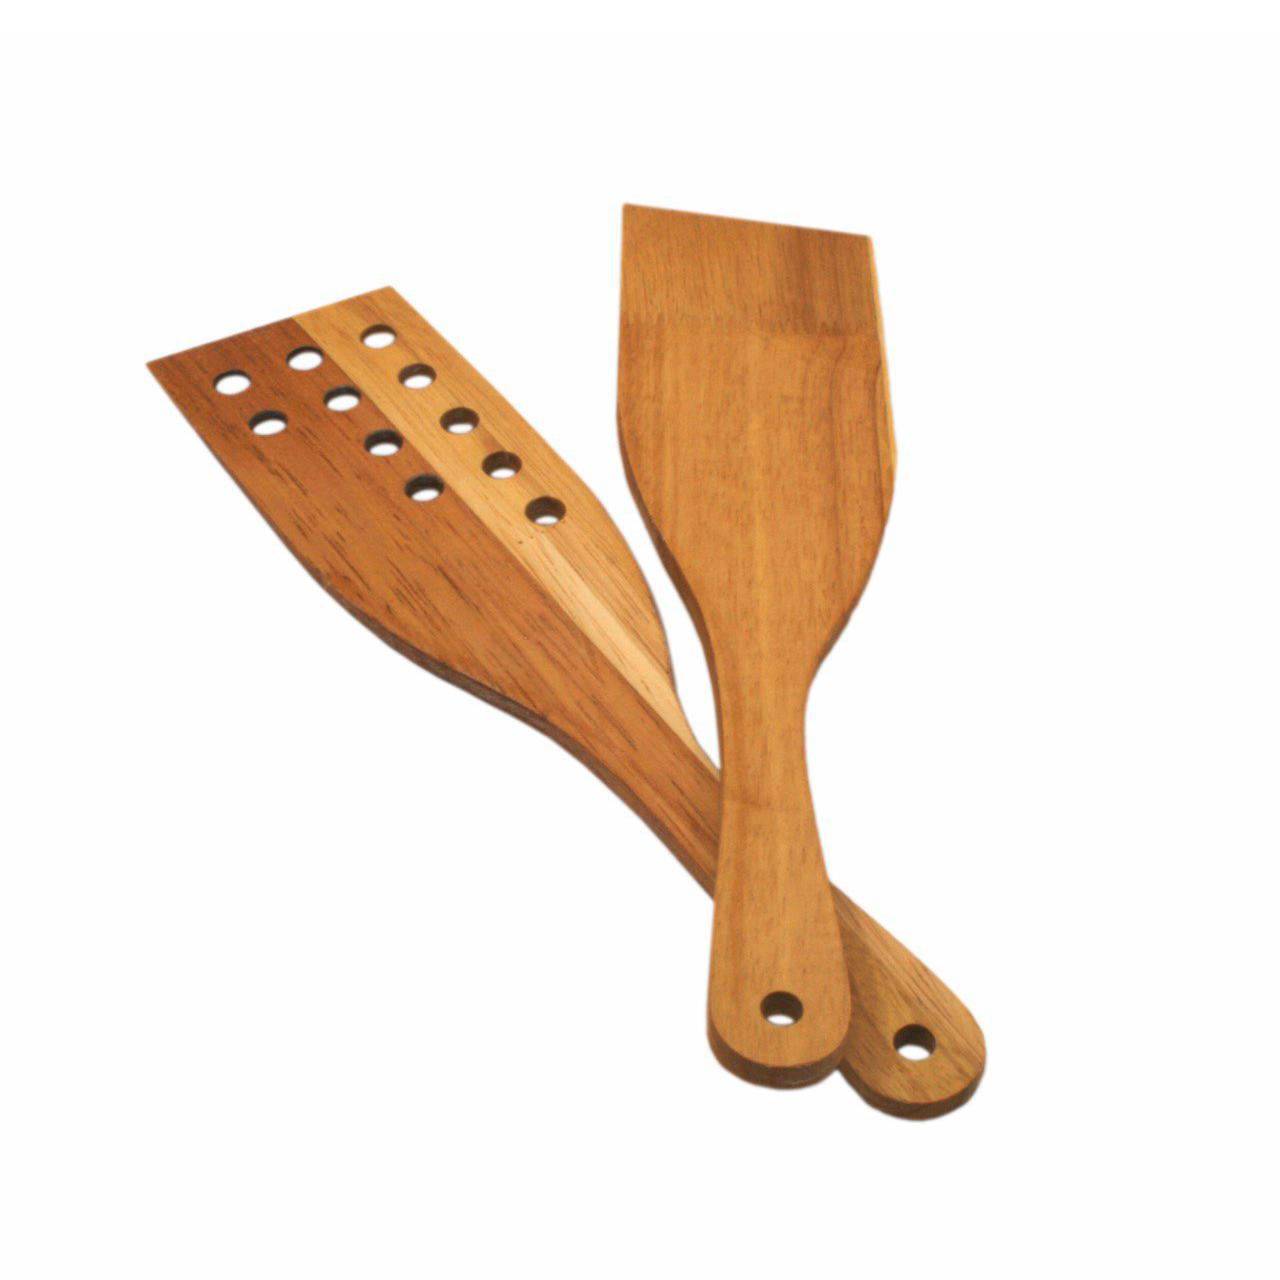 چاقو آشپزخانه ترامونتینا کد 21127077